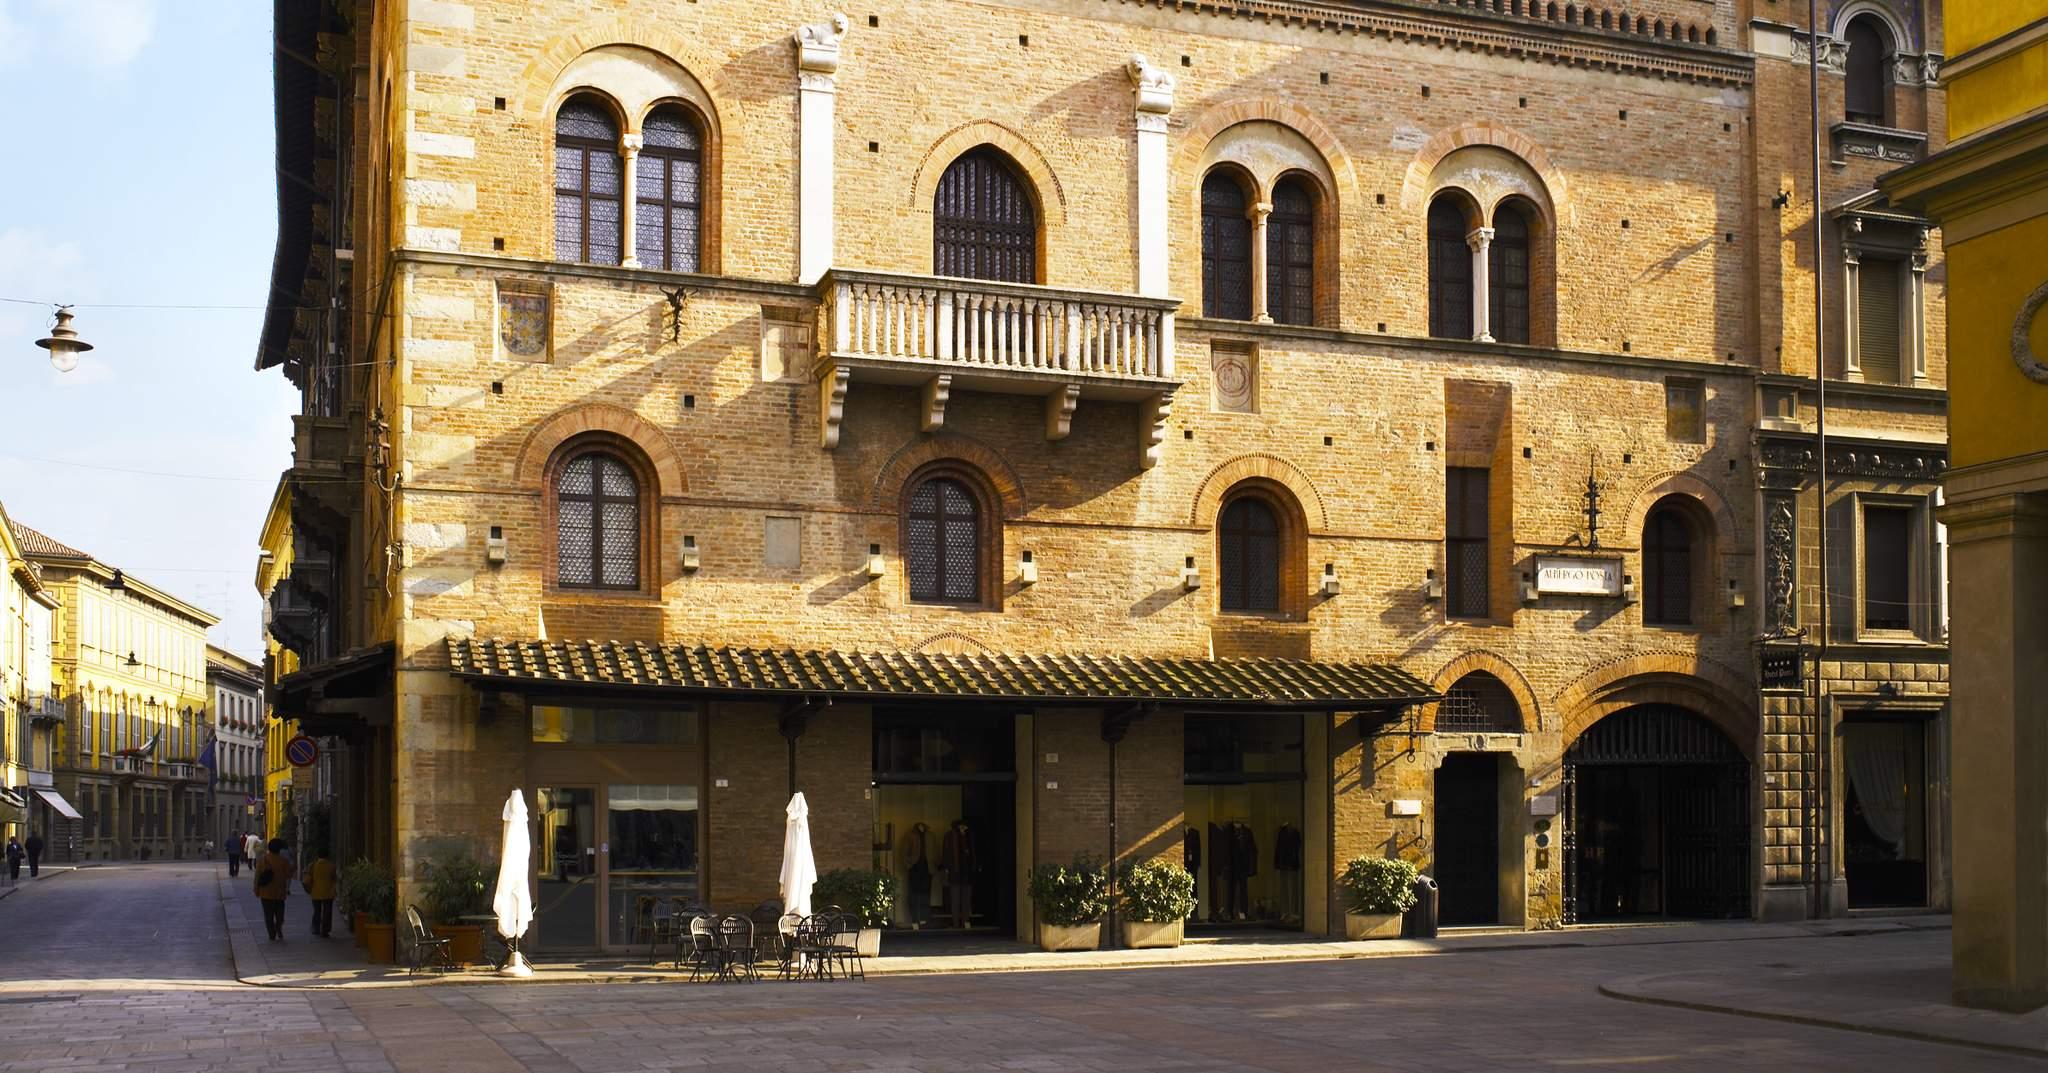 Hotel Posta In Reggio Emilia Italy